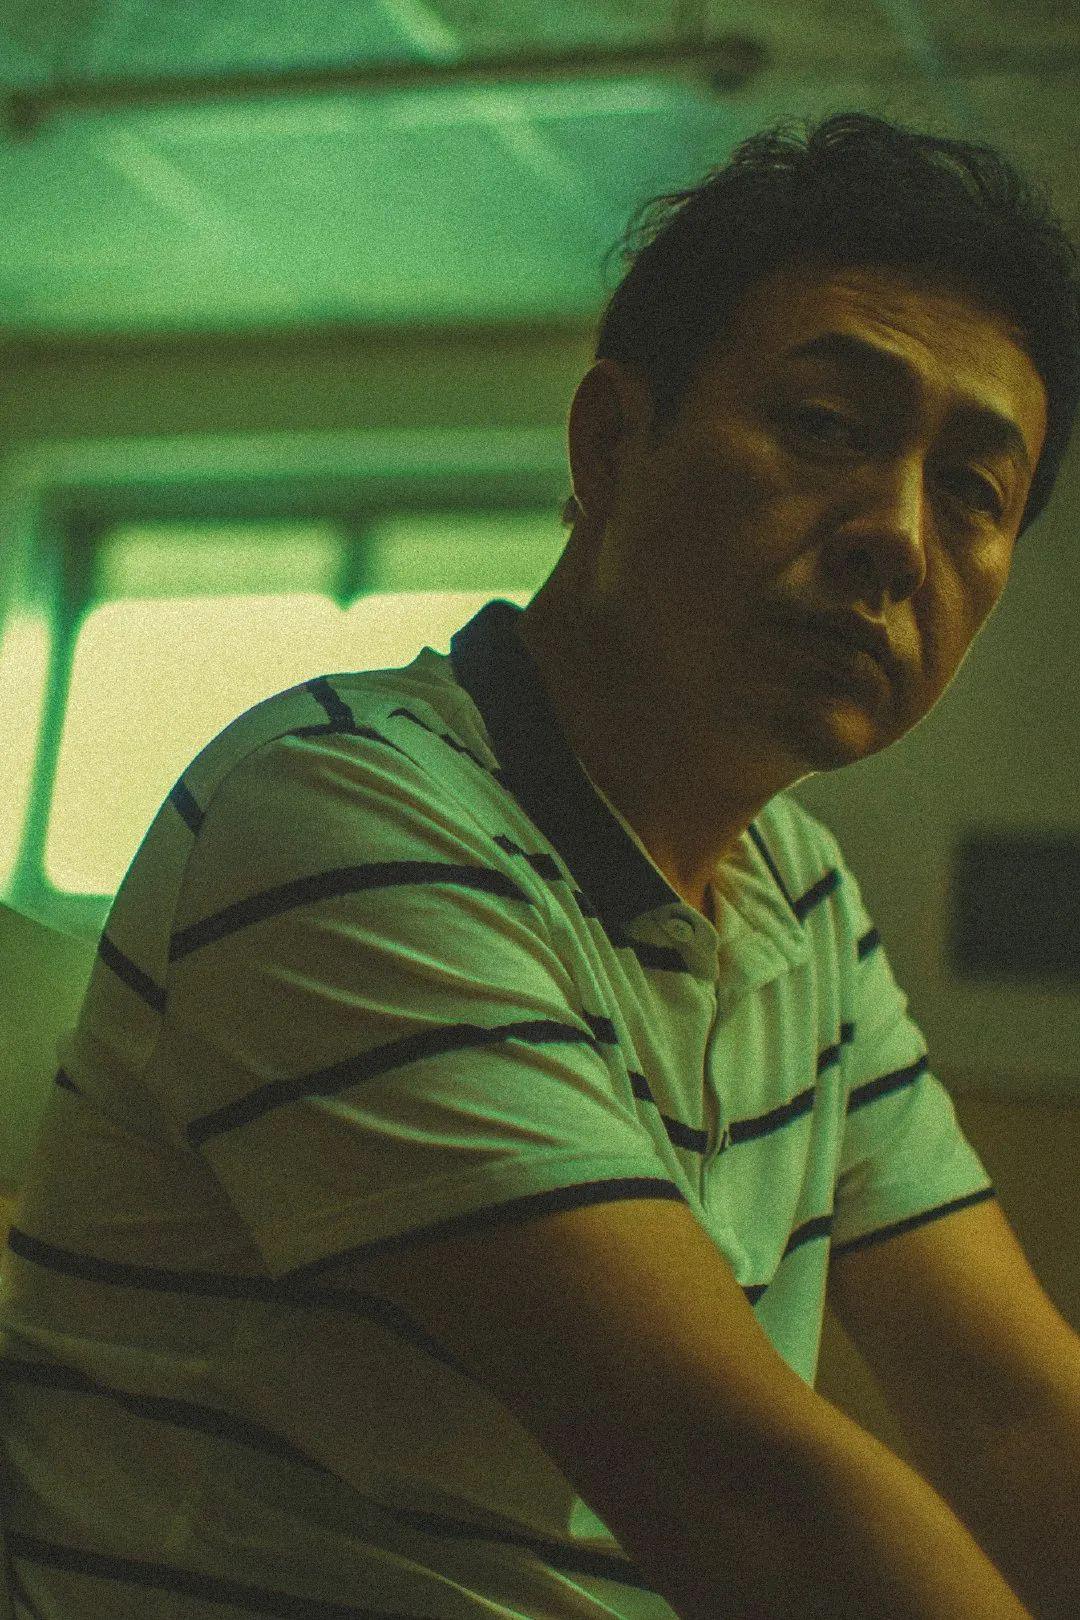 www.allbetgame.us:张颂文:凭《隐秘的角落》受到一定,被骂也开心